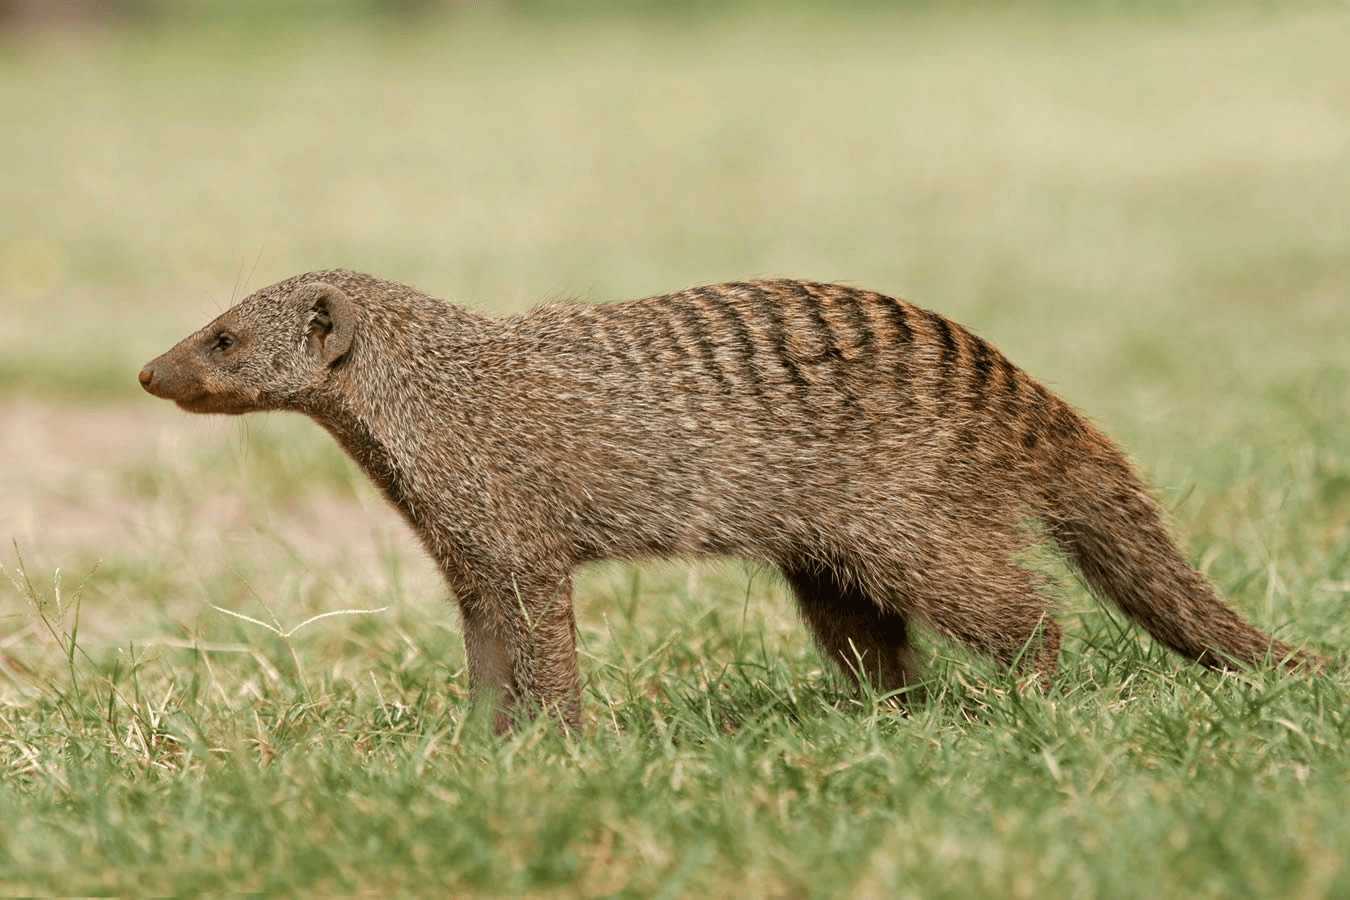 Mongoose Desktop wallpapers